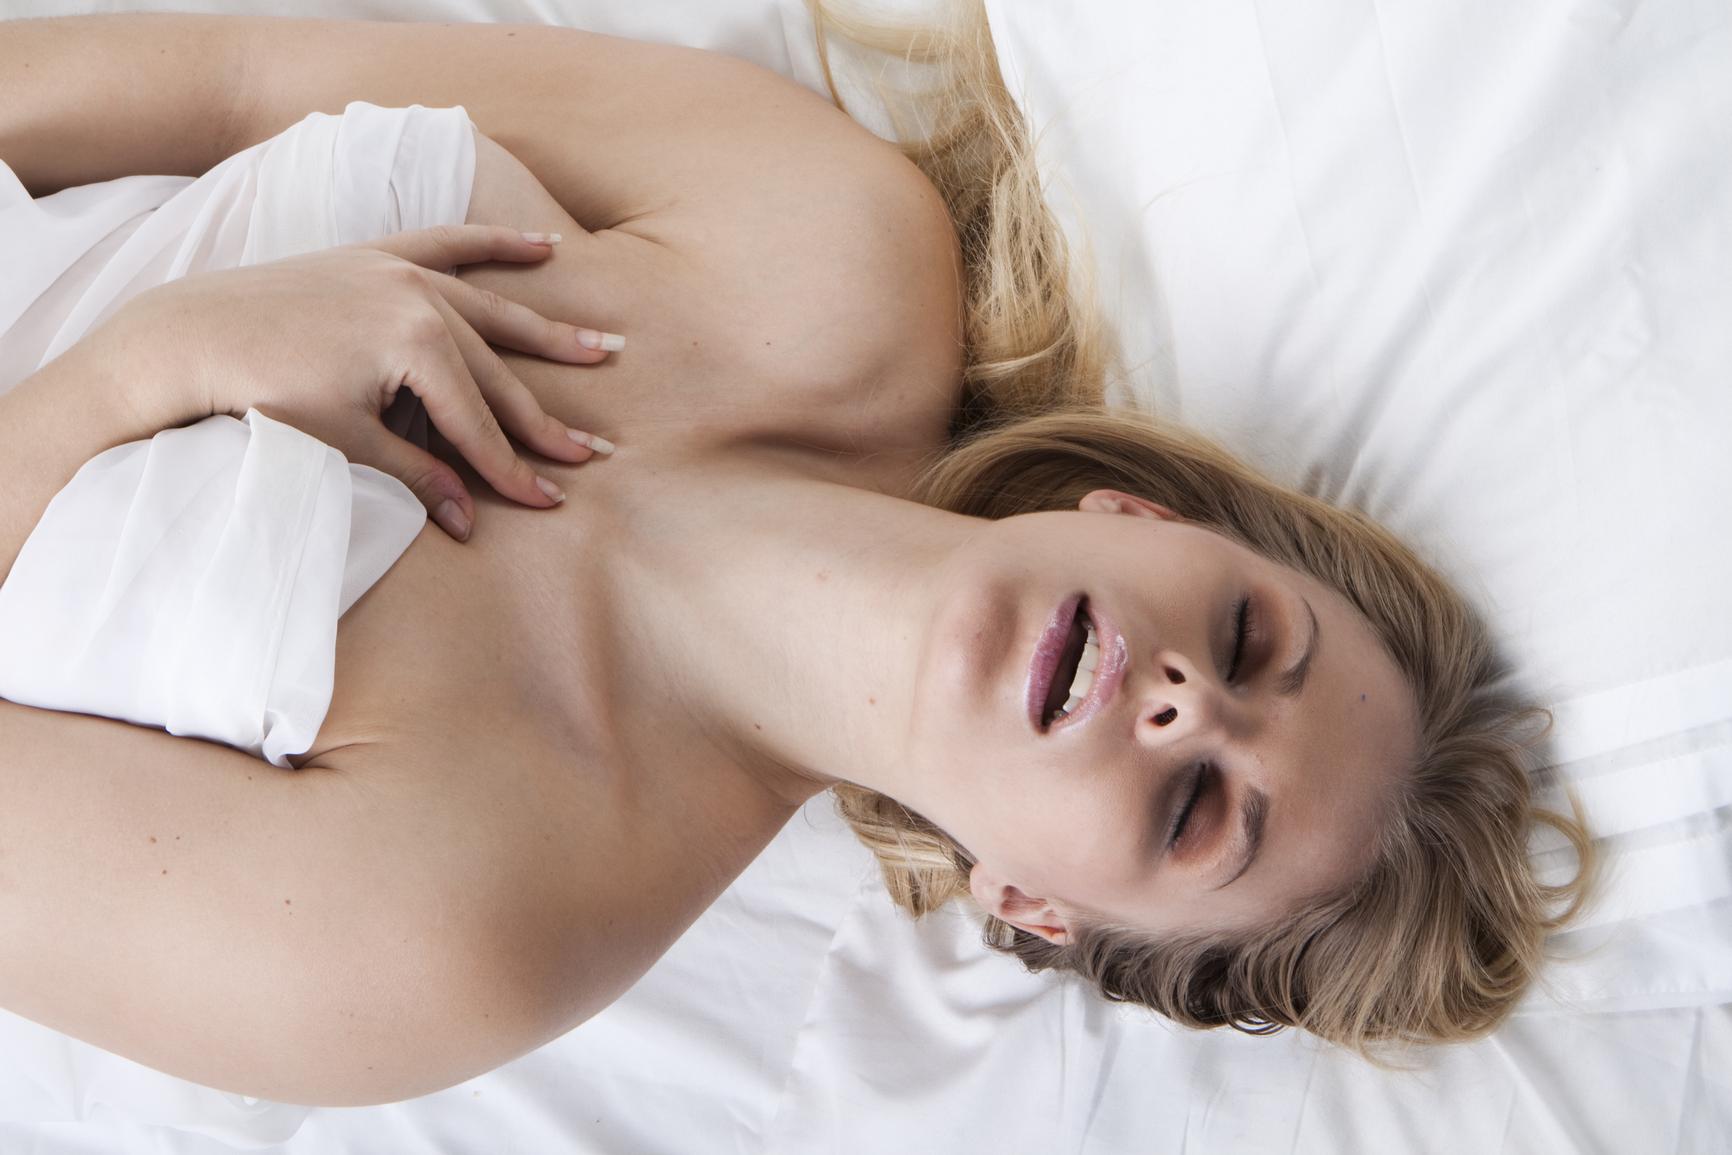 Virgin anal sex blonde